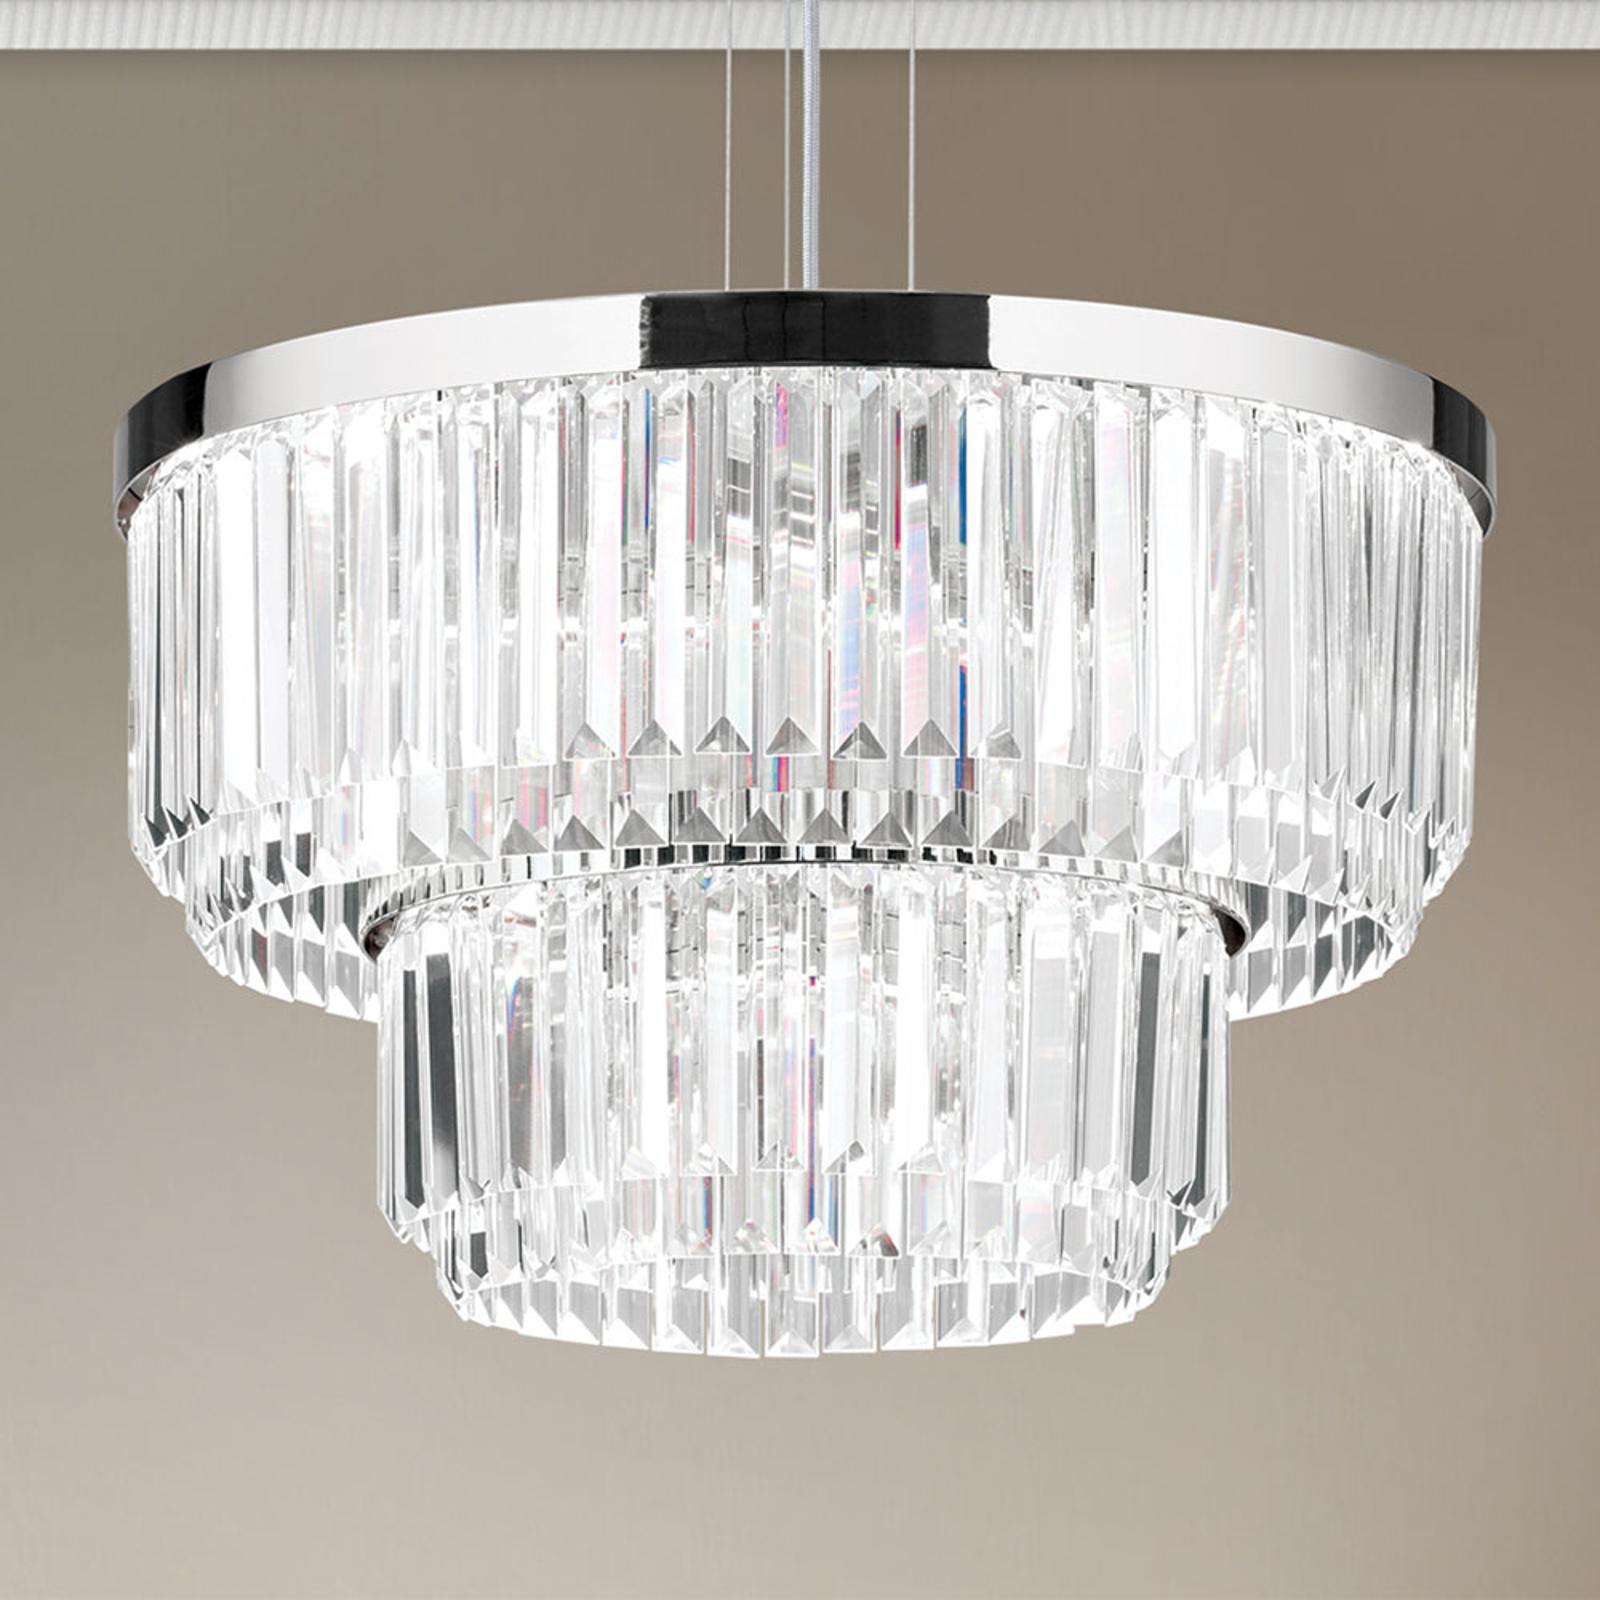 LED-hengelampe Prisme, rund, krom